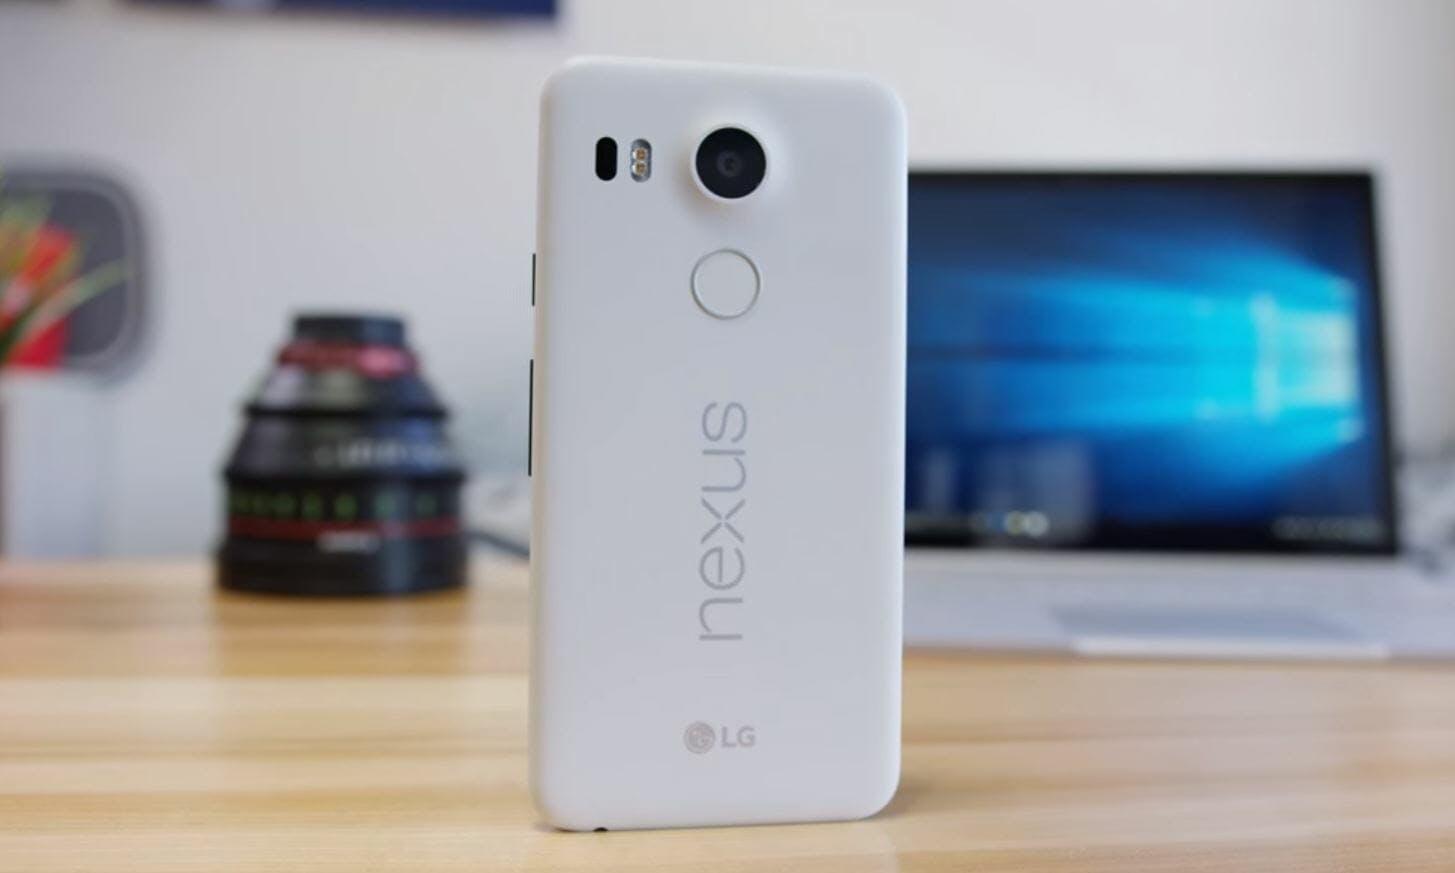 project fi phones - google nexus 5x lg